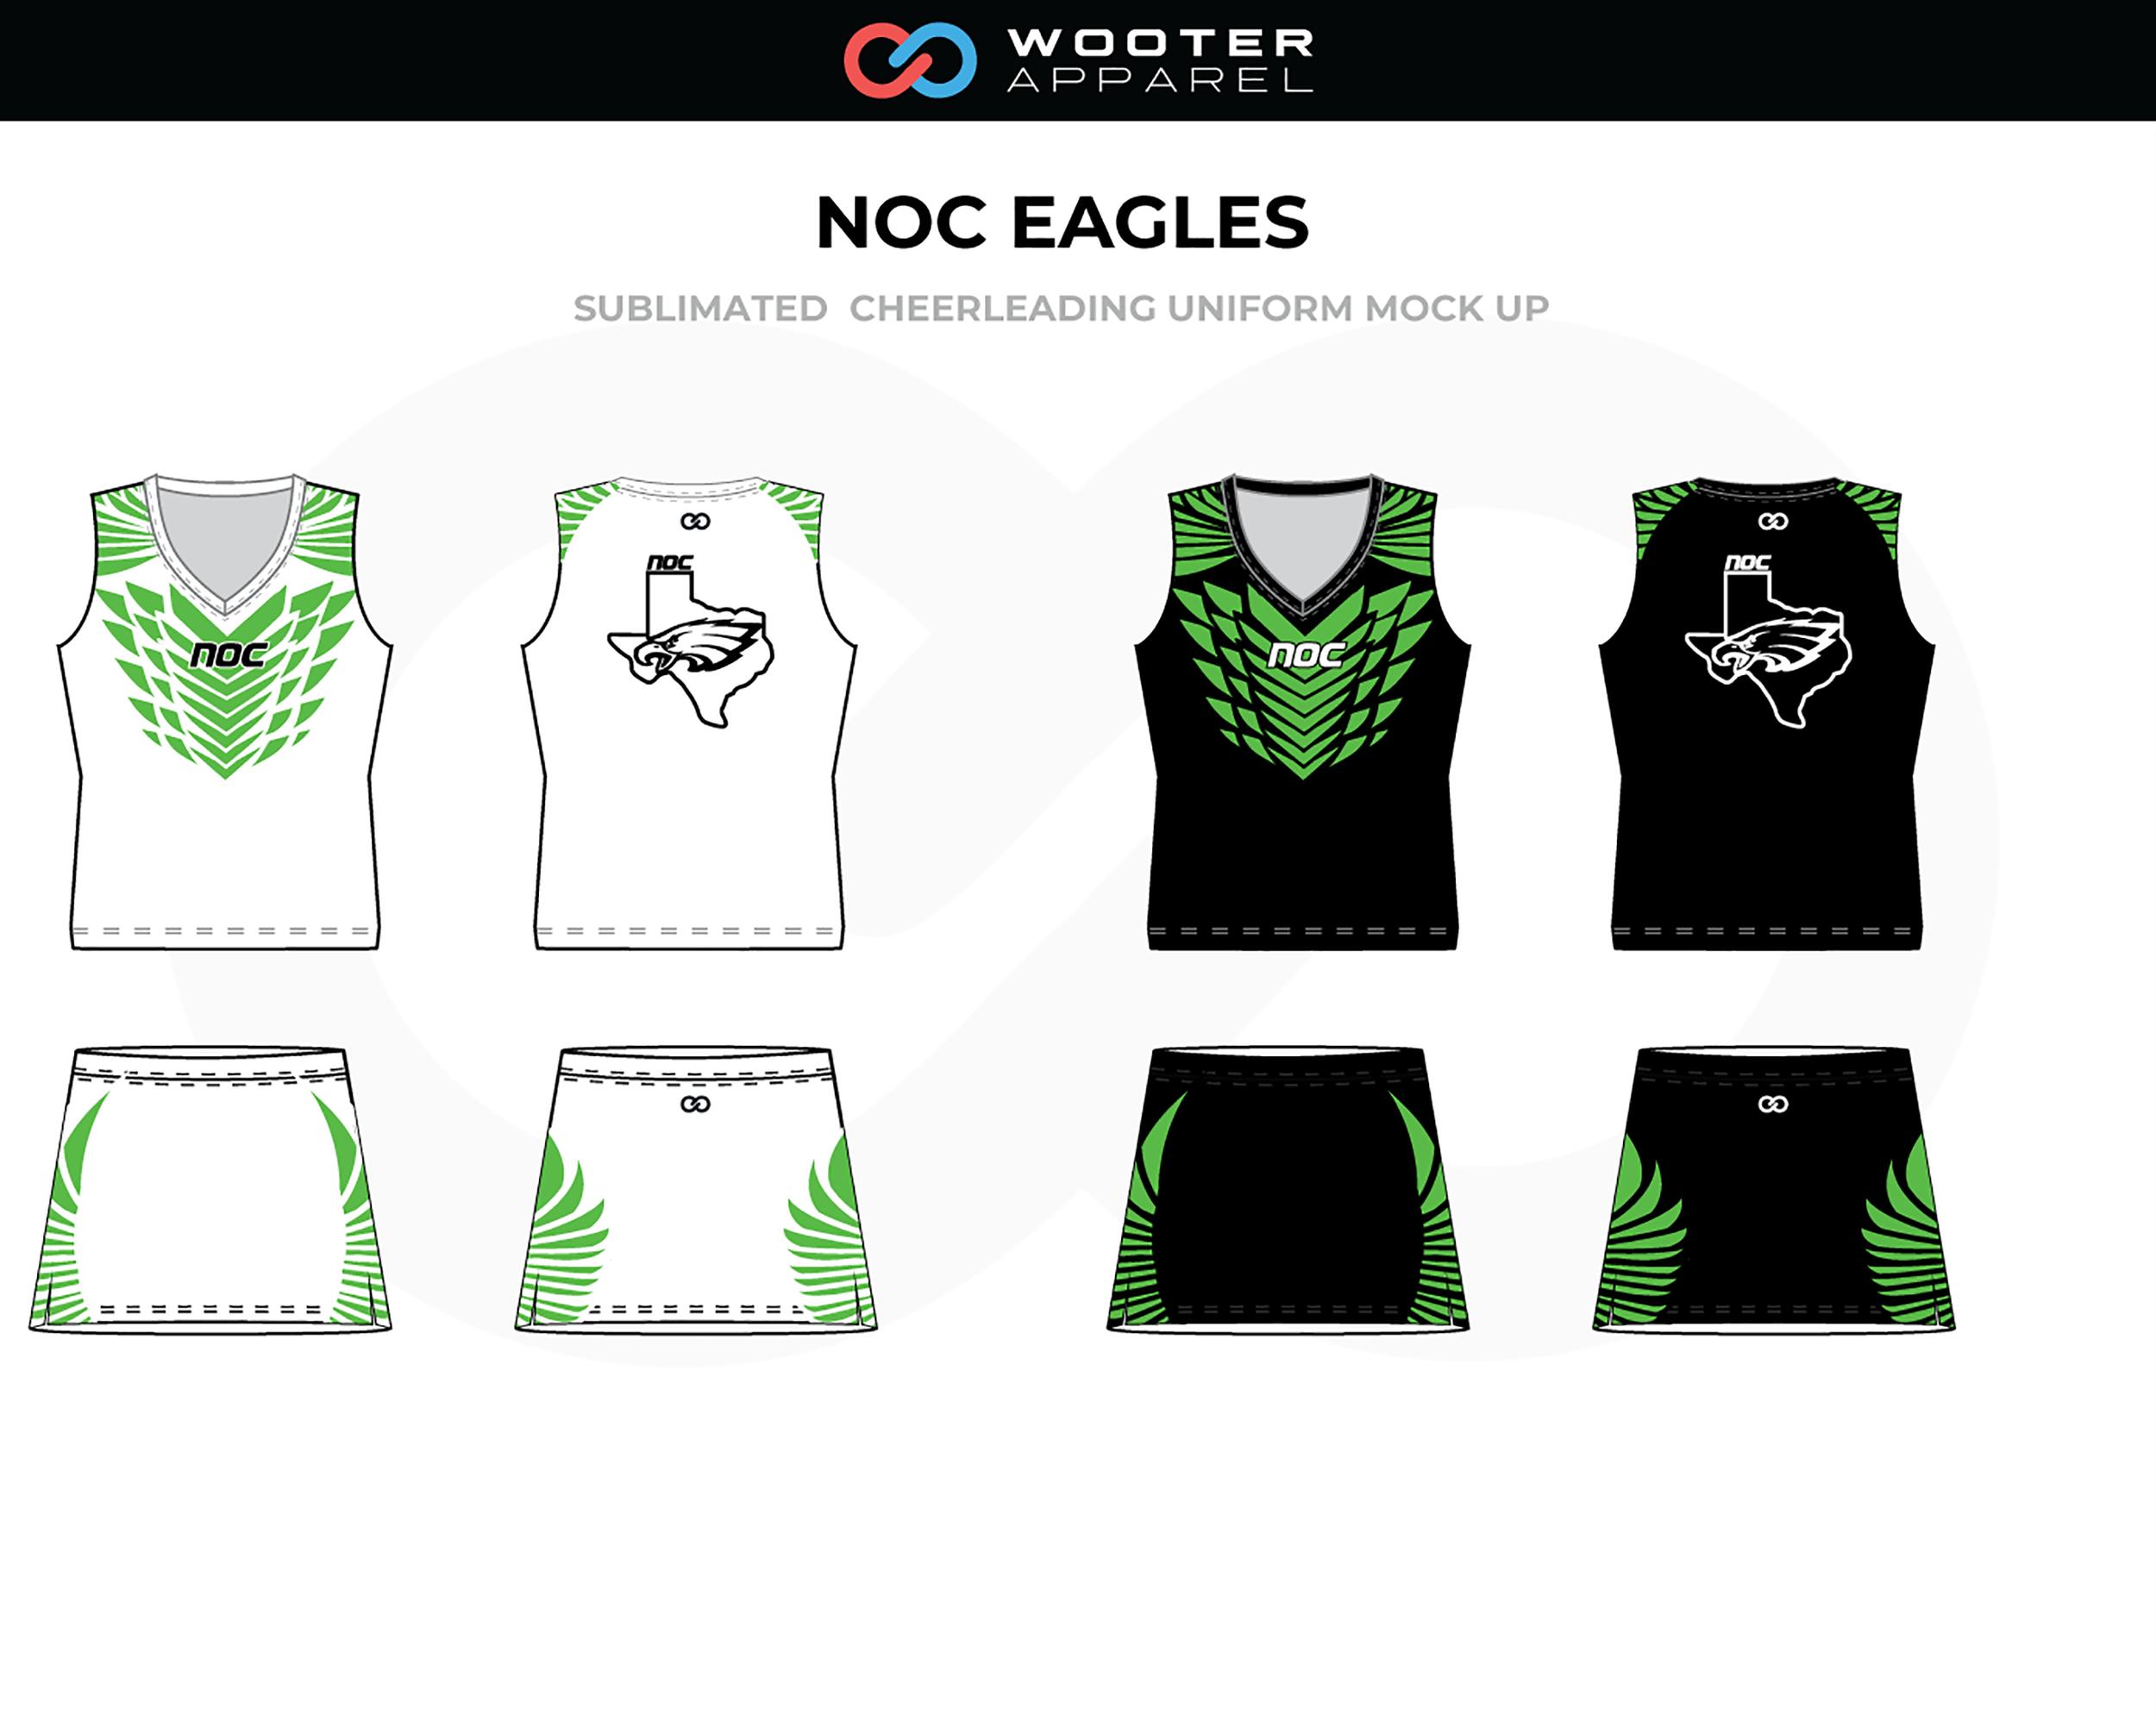 NOC EAGLES White Green Black Cheer Uniform, Sleeveless and Skirts